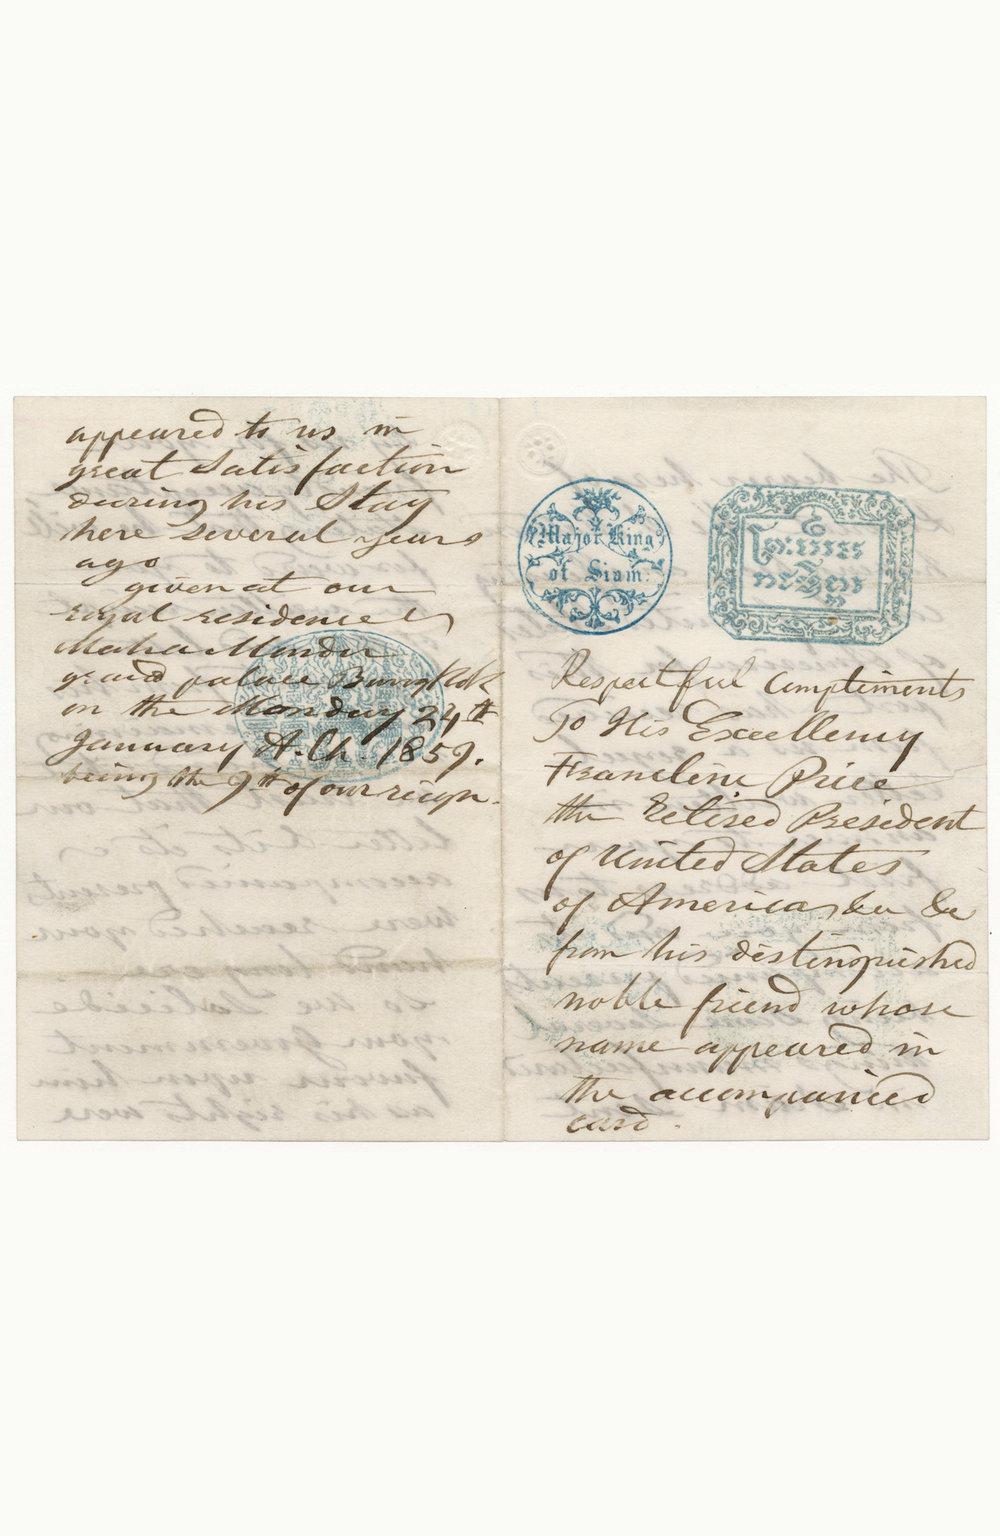 Letter from King Mongkut to President Franklin Pierce (excerpt), 1859 Courtesy of the National Archives and Records Administration, General Records of the United States Government; 6923542  พระราชสาส์นในพระบาทสมเด็จพระจอมเกล้าเจ้าอยู่หัว พระราชทานแก่ประธานาธิบดีแฟรงกลิน เพียร์ซ (ตัดมาบางส่วน) พ.ศ. ๒๔๐๒ ได้รับความอนุเคราะห์จากแผนกบันทึกทั่วไปของรัฐบาลสหรัฐอเมริกา องค์การบริหารจดหมายเหตุและบันทึกแห่งชาติ; 6923542